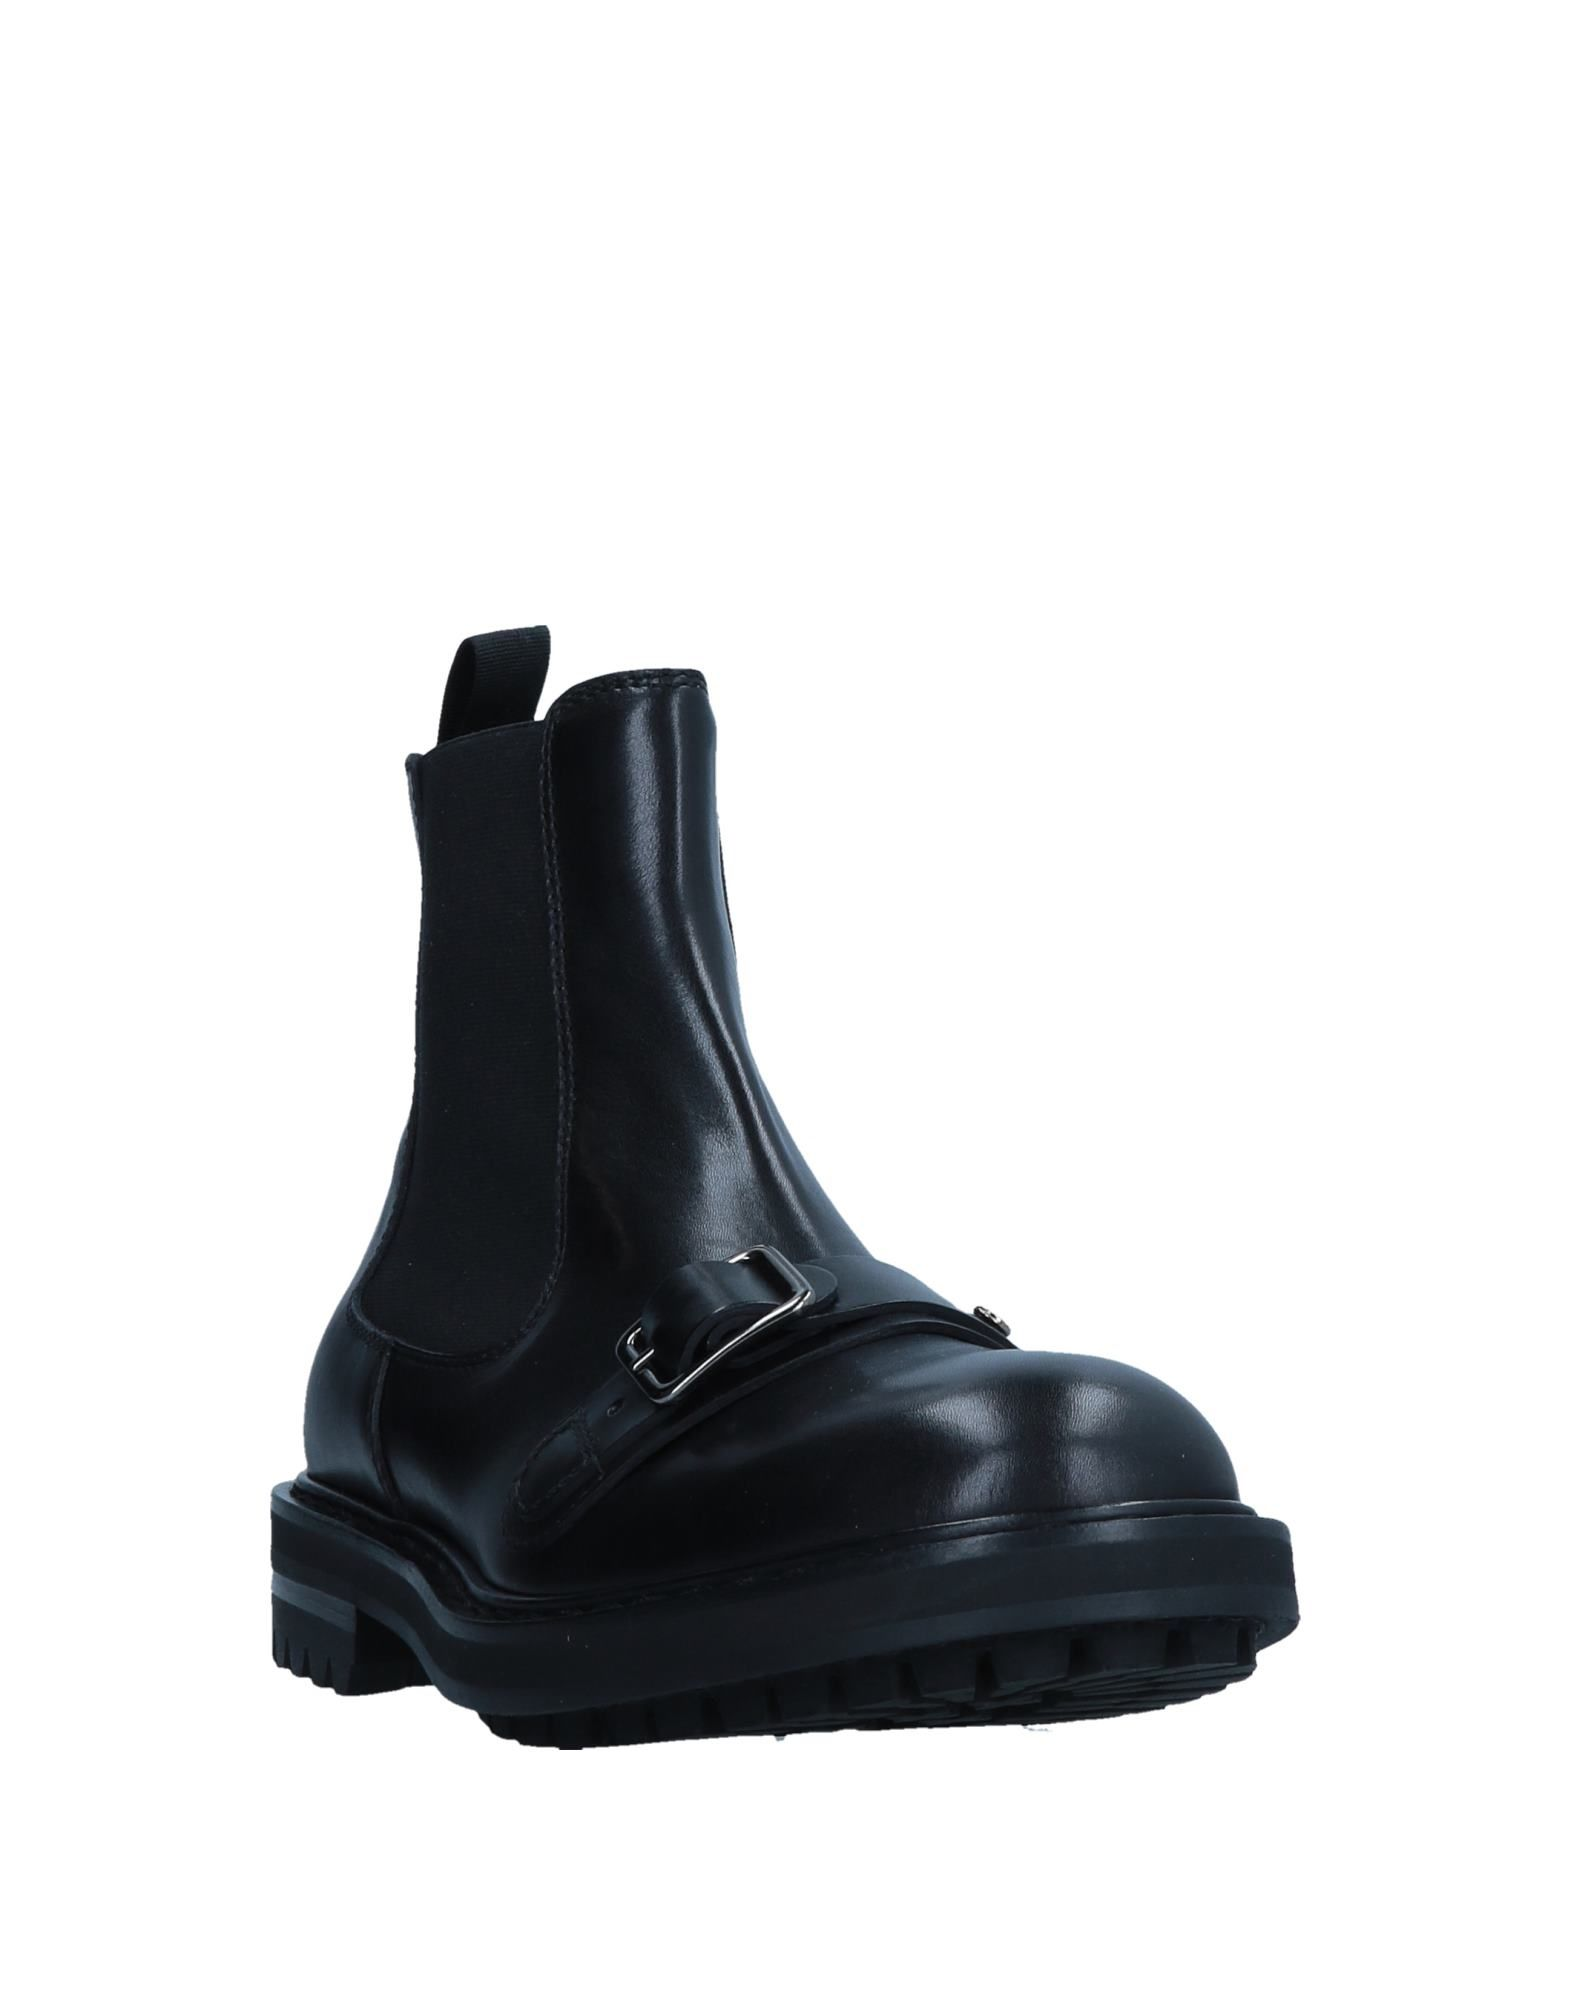 Alexander Mcqueen Stiefelette Herren  Schuhe 11552673JN Gute Qualität beliebte Schuhe  fad04b